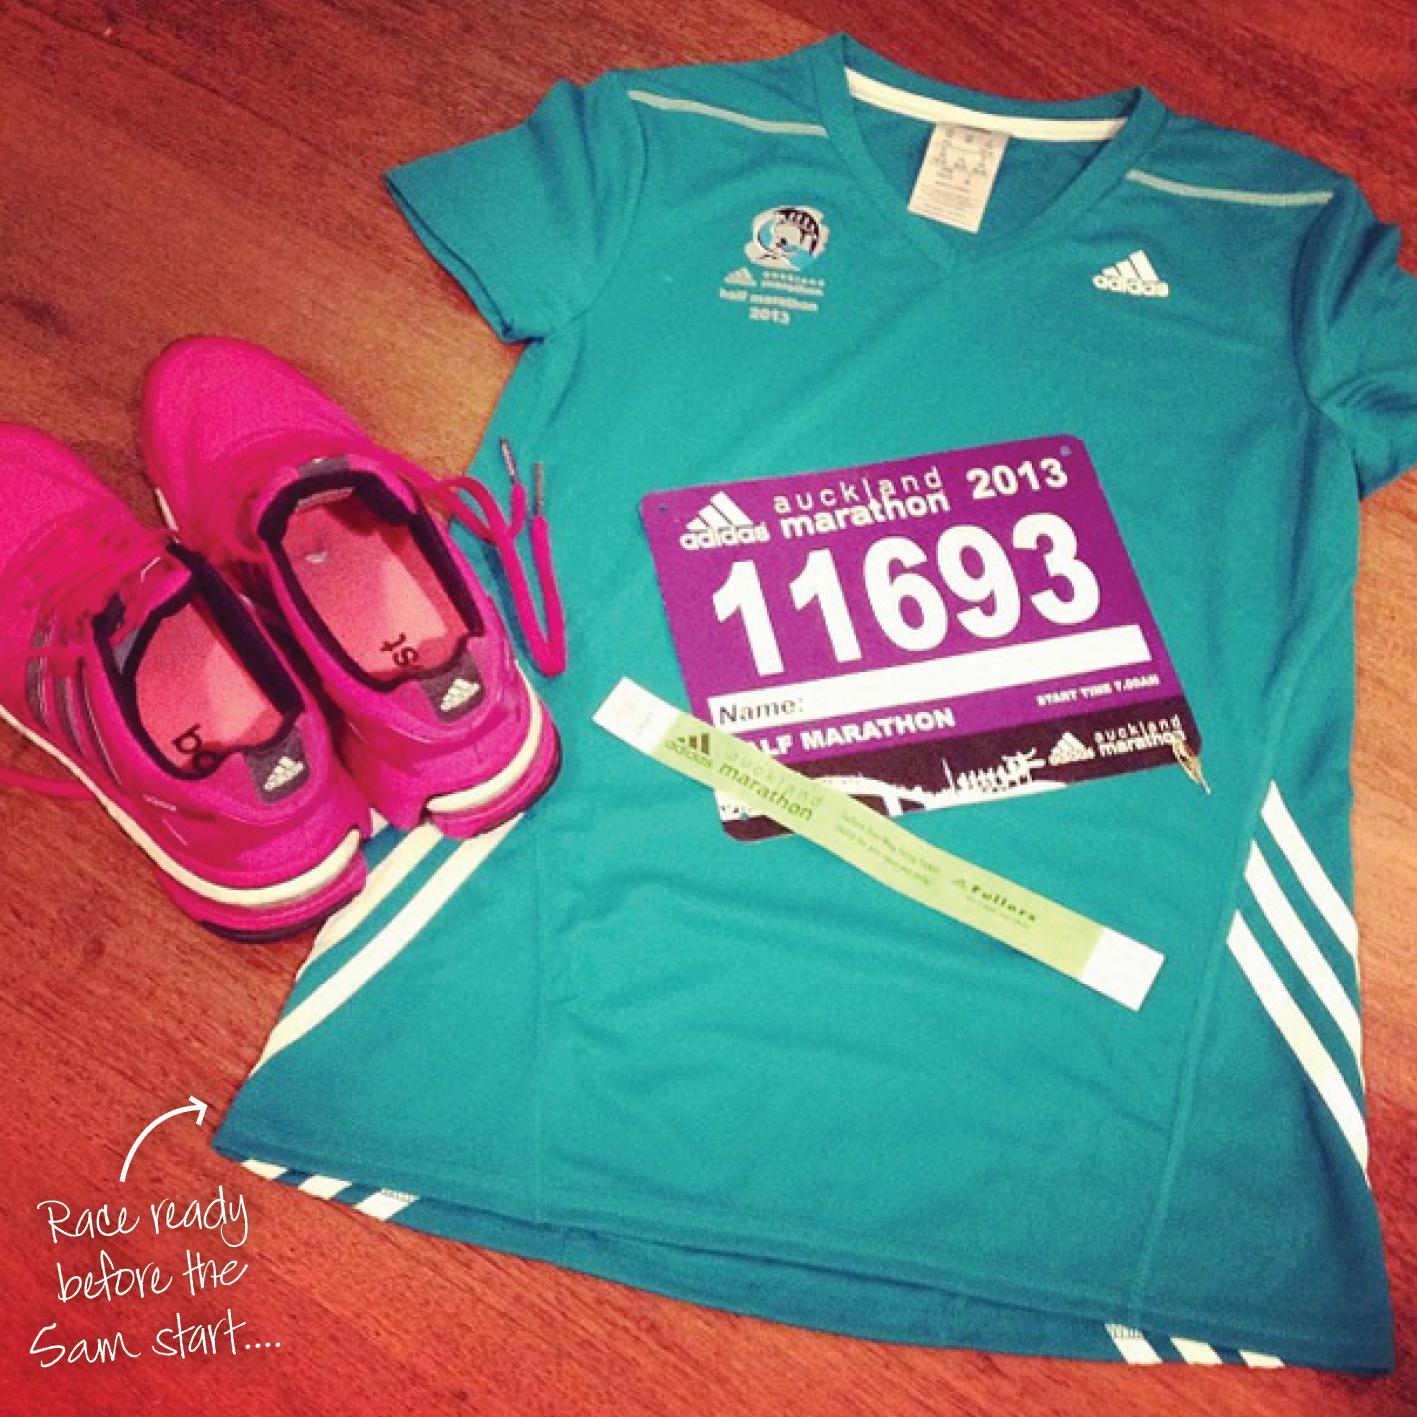 The Marathon2